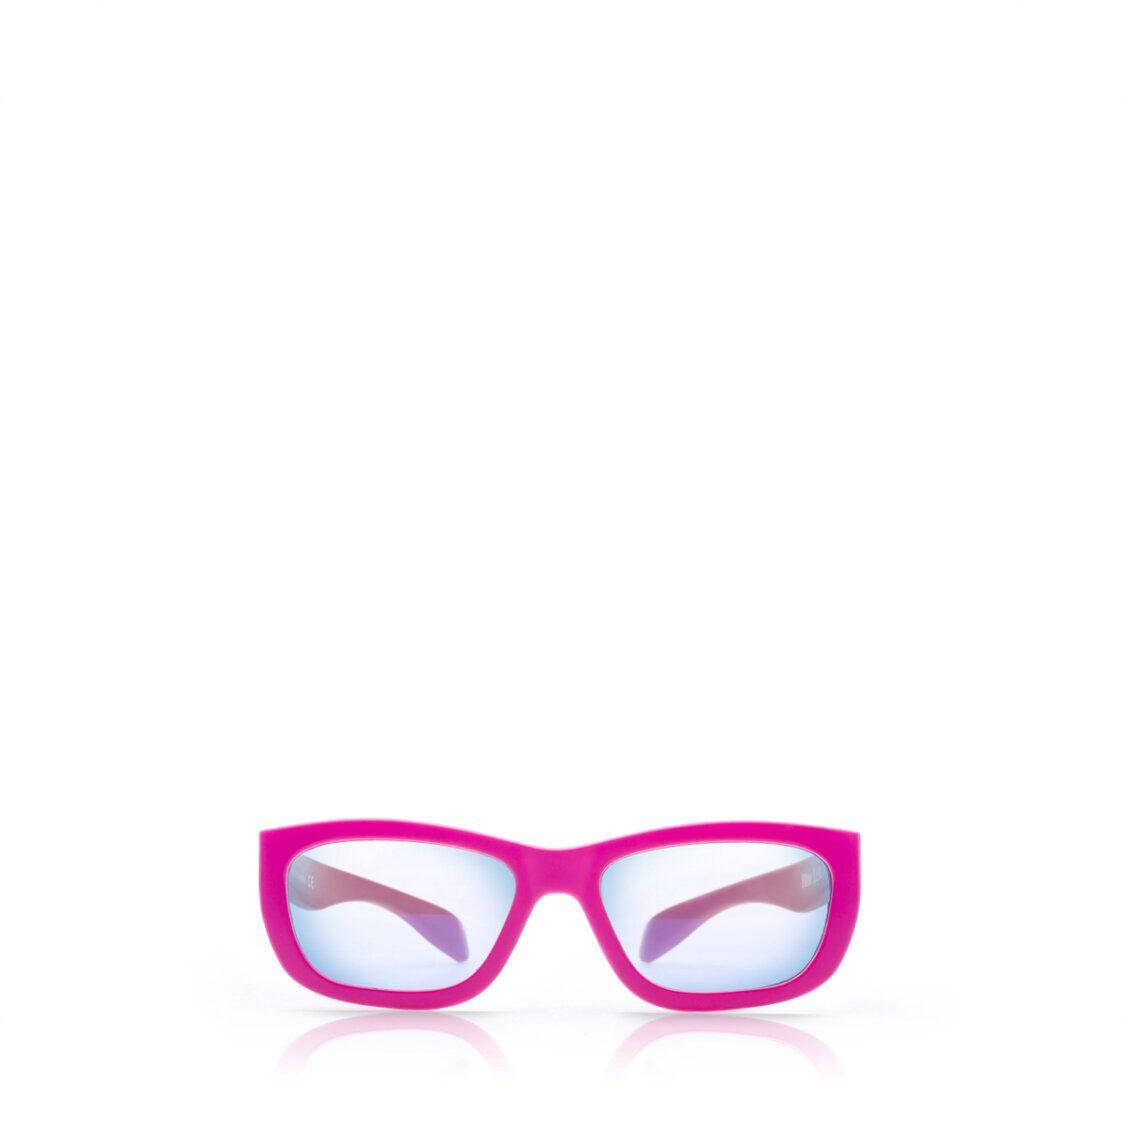 Shadez Eyewear Blue Light Pink Adult 16 years old